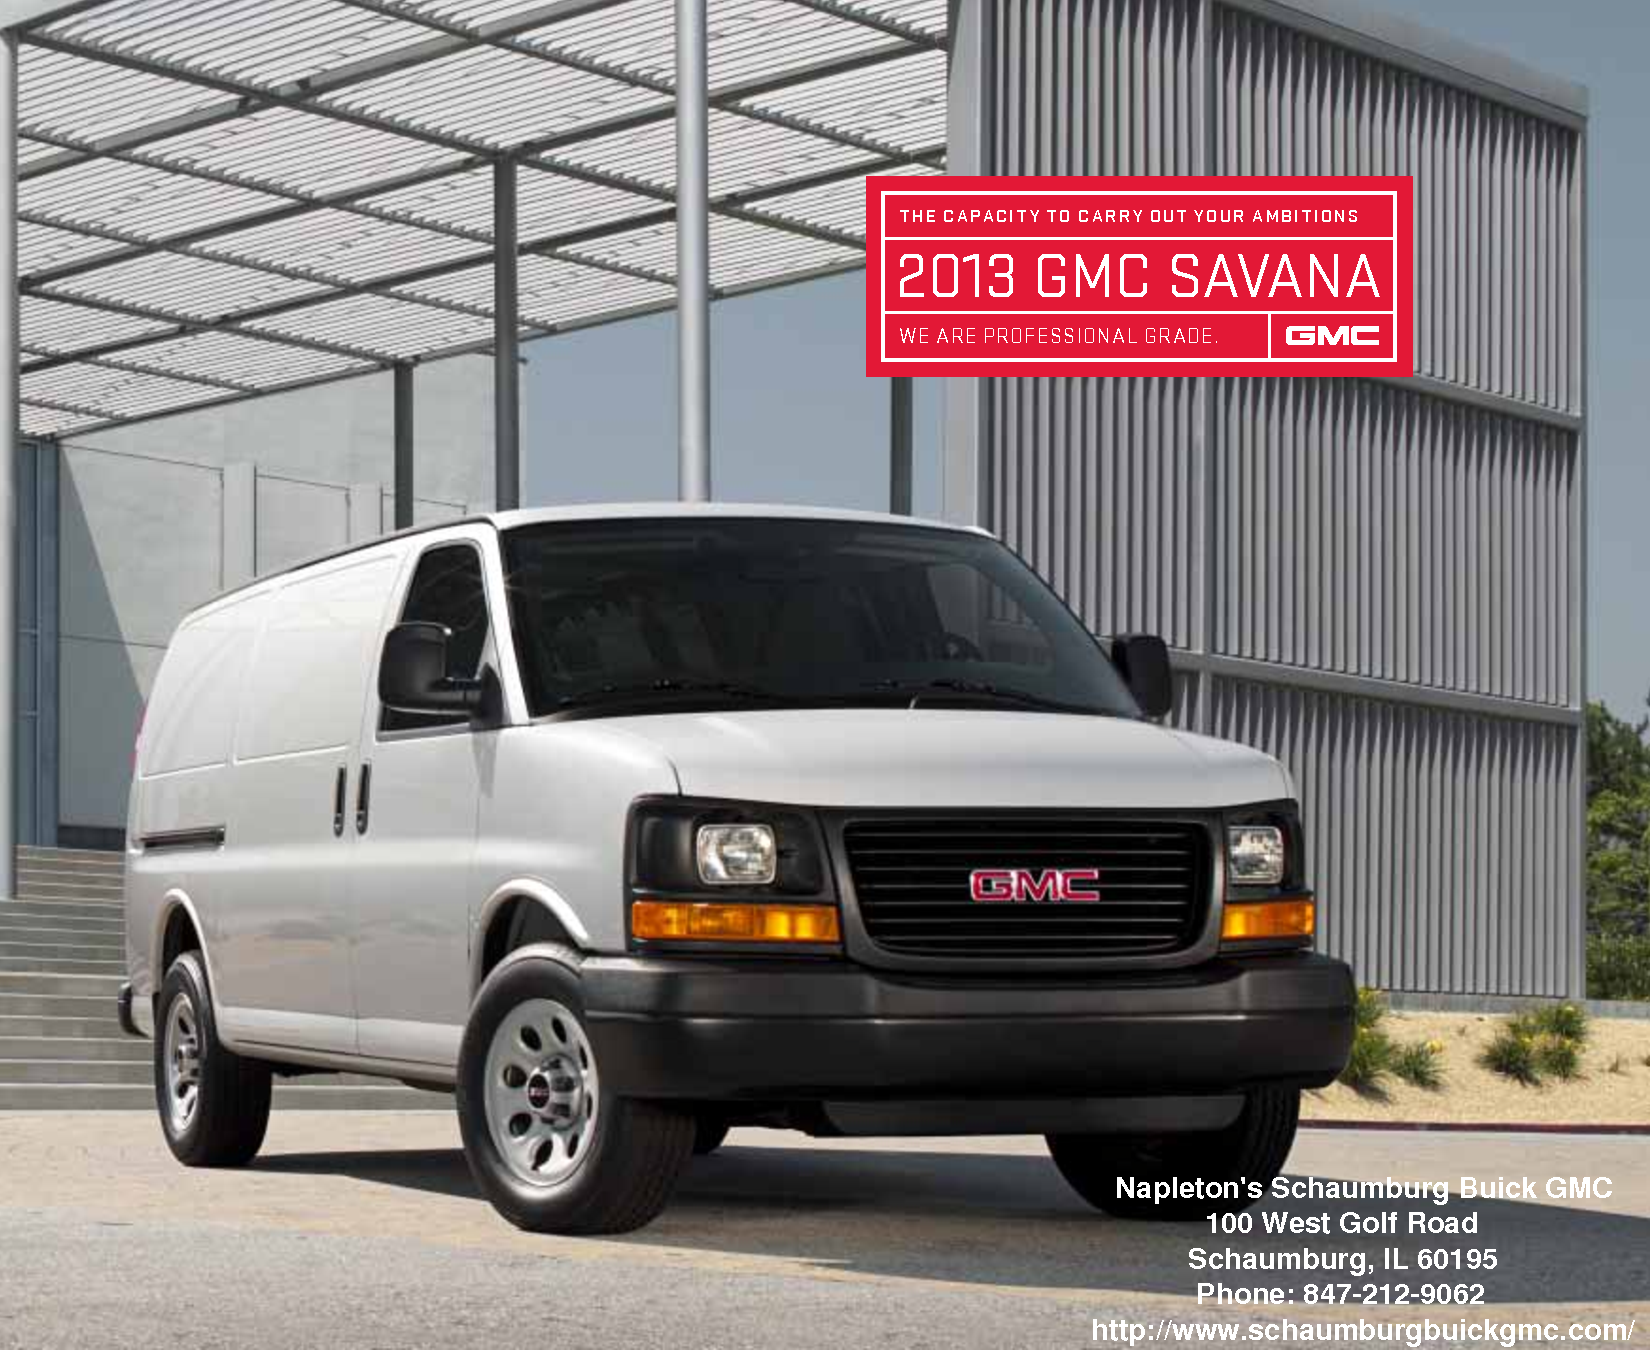 GMC Savana 1500-2 - specs, photos, videos and more on TopWorldAuto